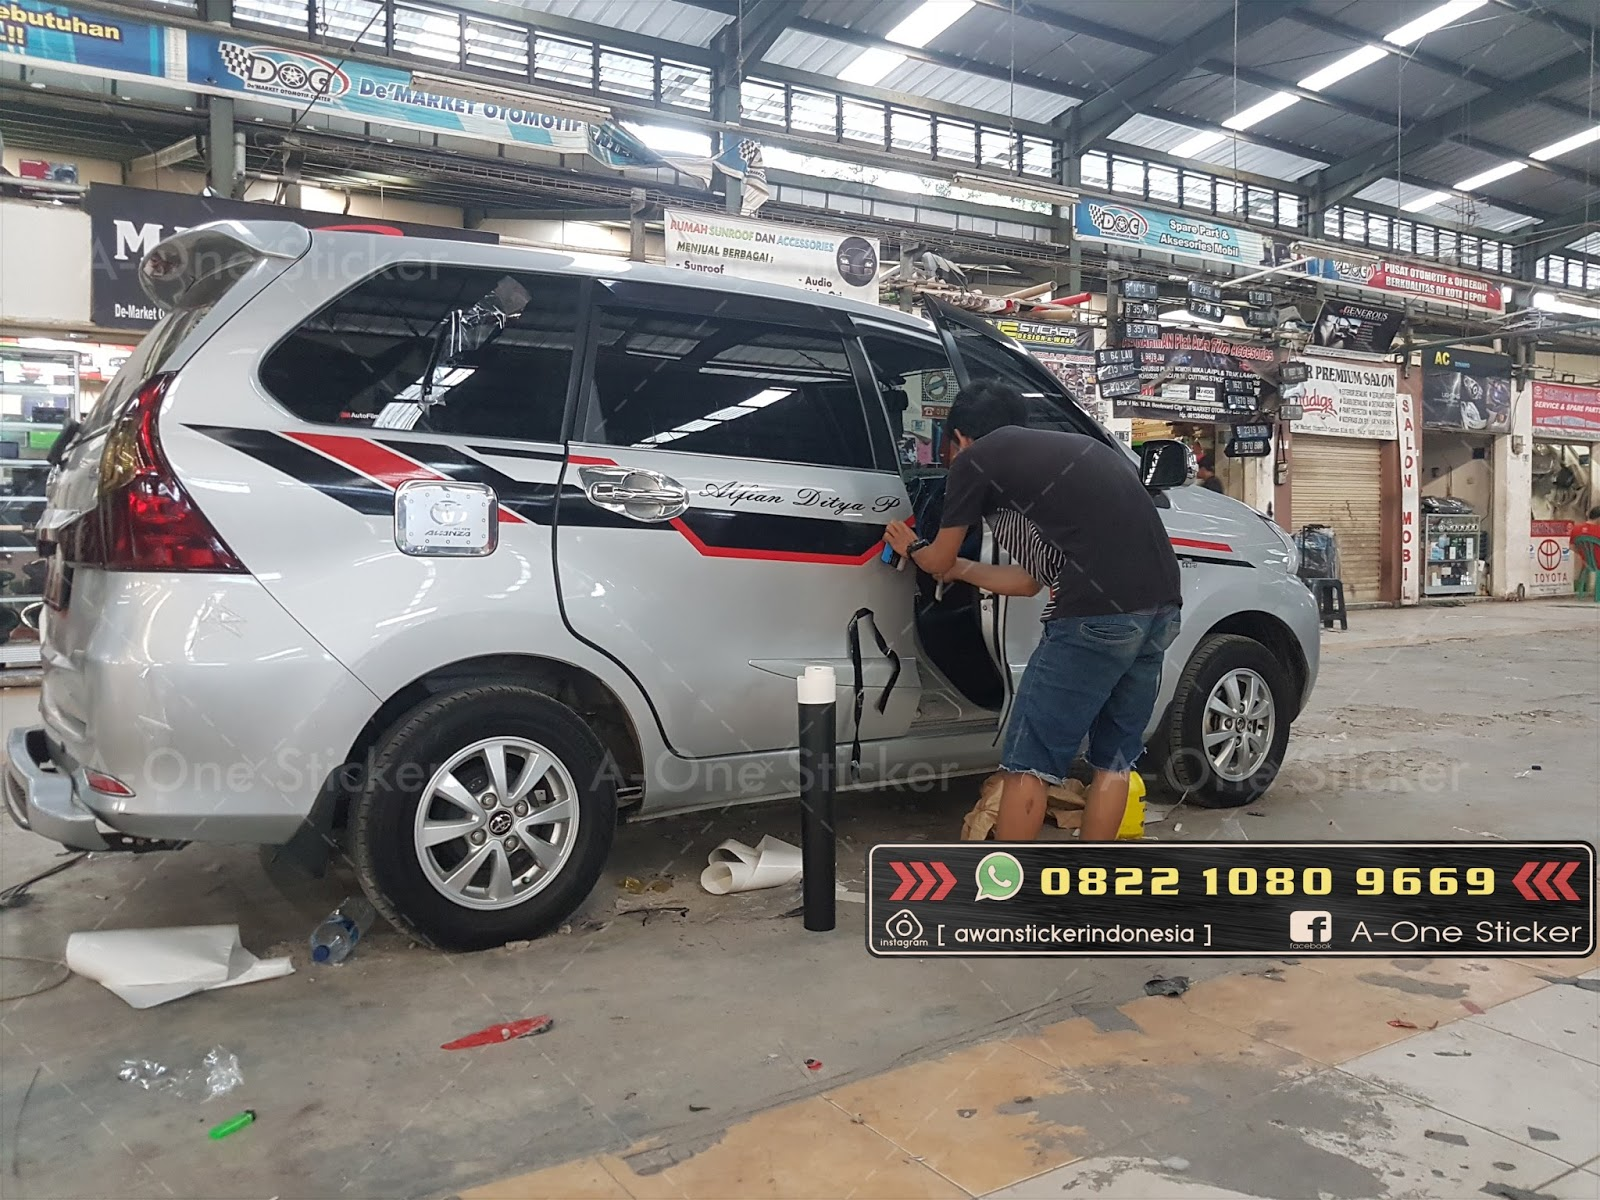 Cutting Sticker Grand New Avanza Tipe E Mobil Modifikasi Depok Jakarta